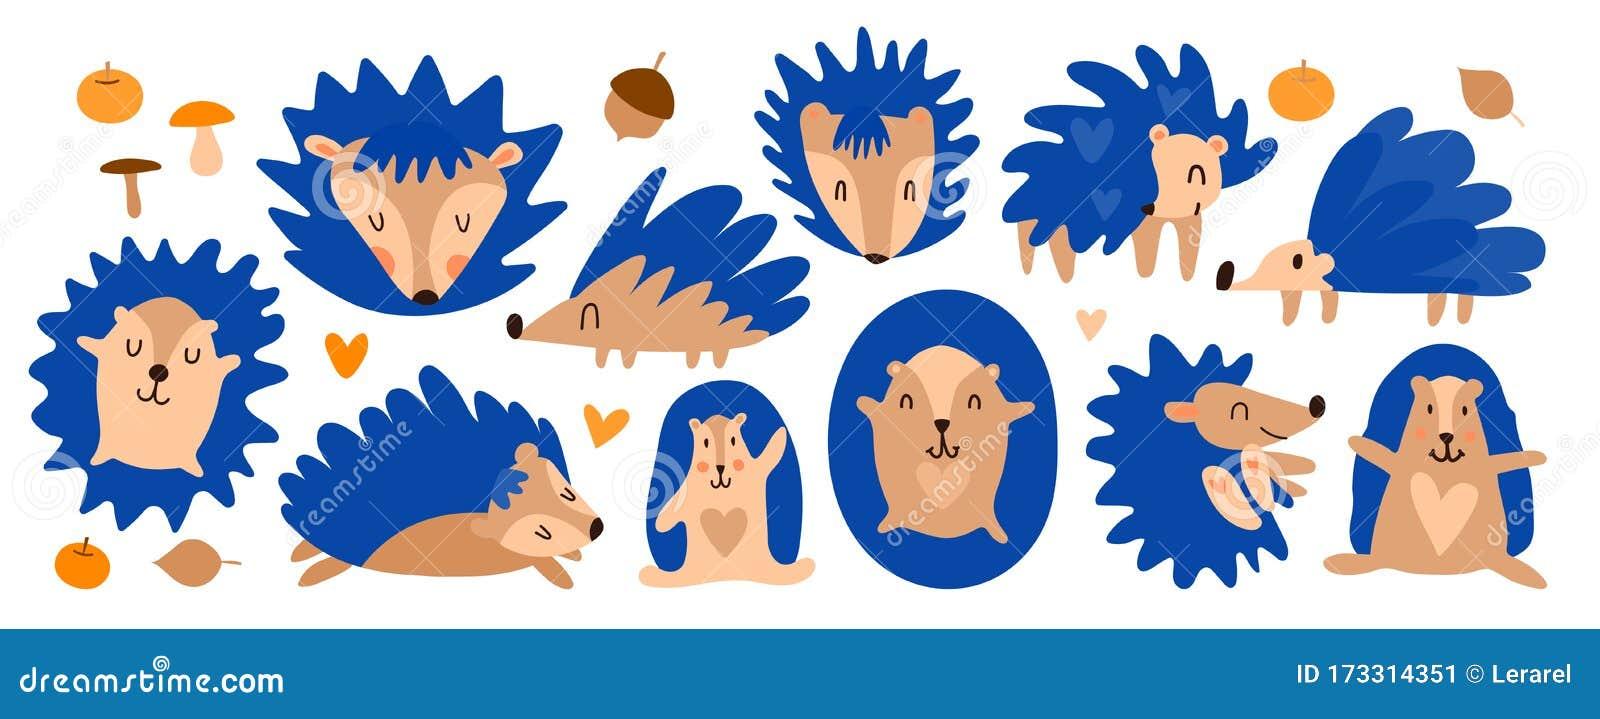 Sonic Hedgehog Stock Illustrations 11 Sonic Hedgehog Stock Illustrations Vectors Clipart Dreamstime